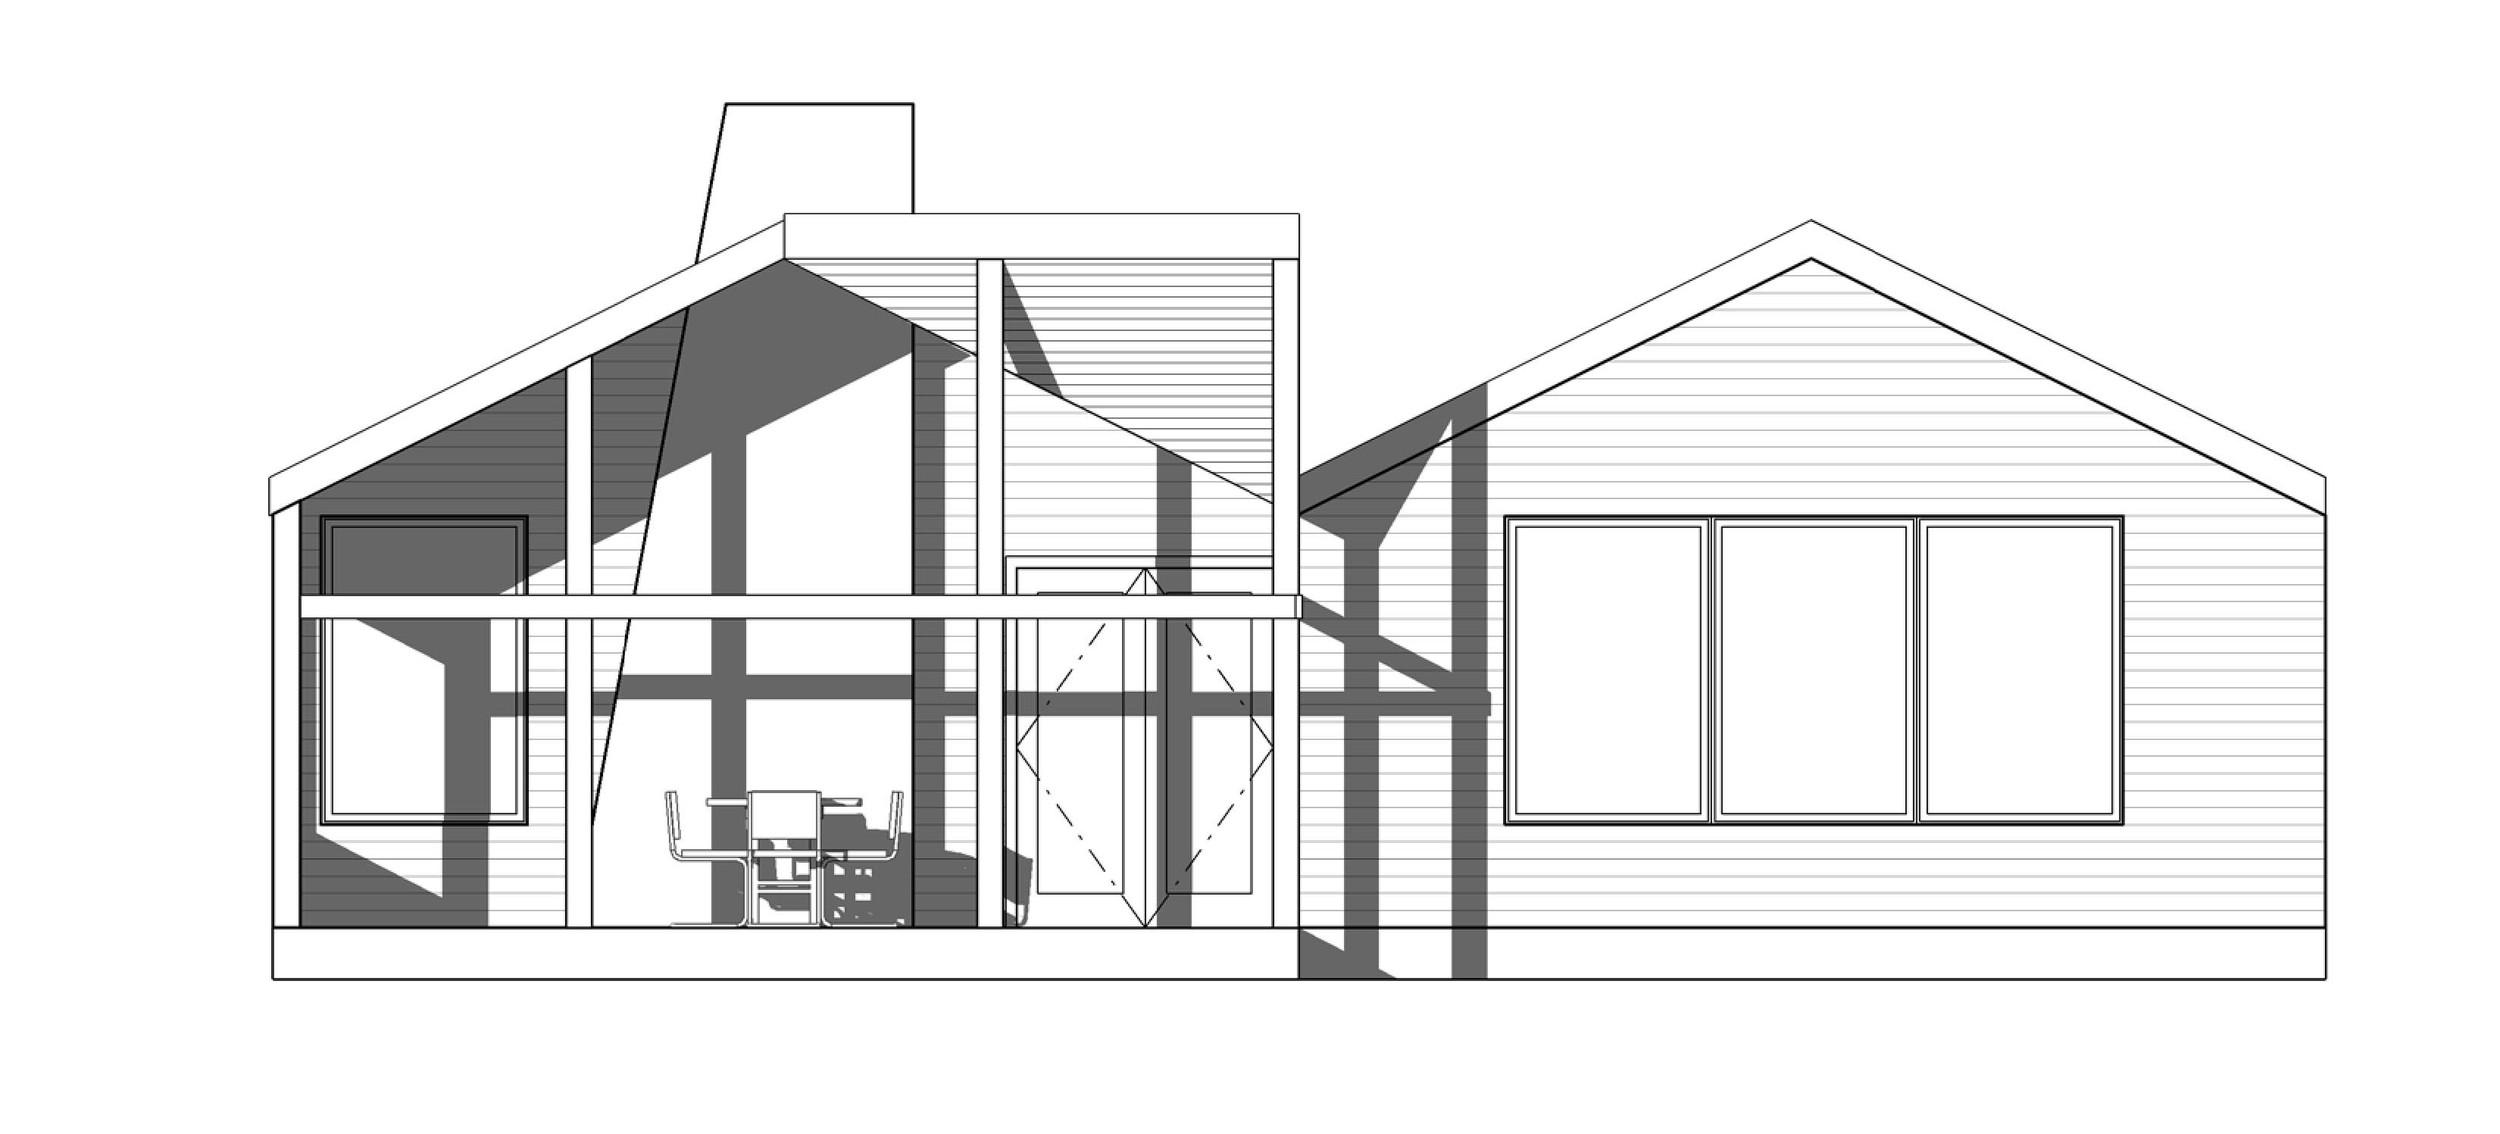 TALLstudio Architecture - Cabin - Louisville, MS